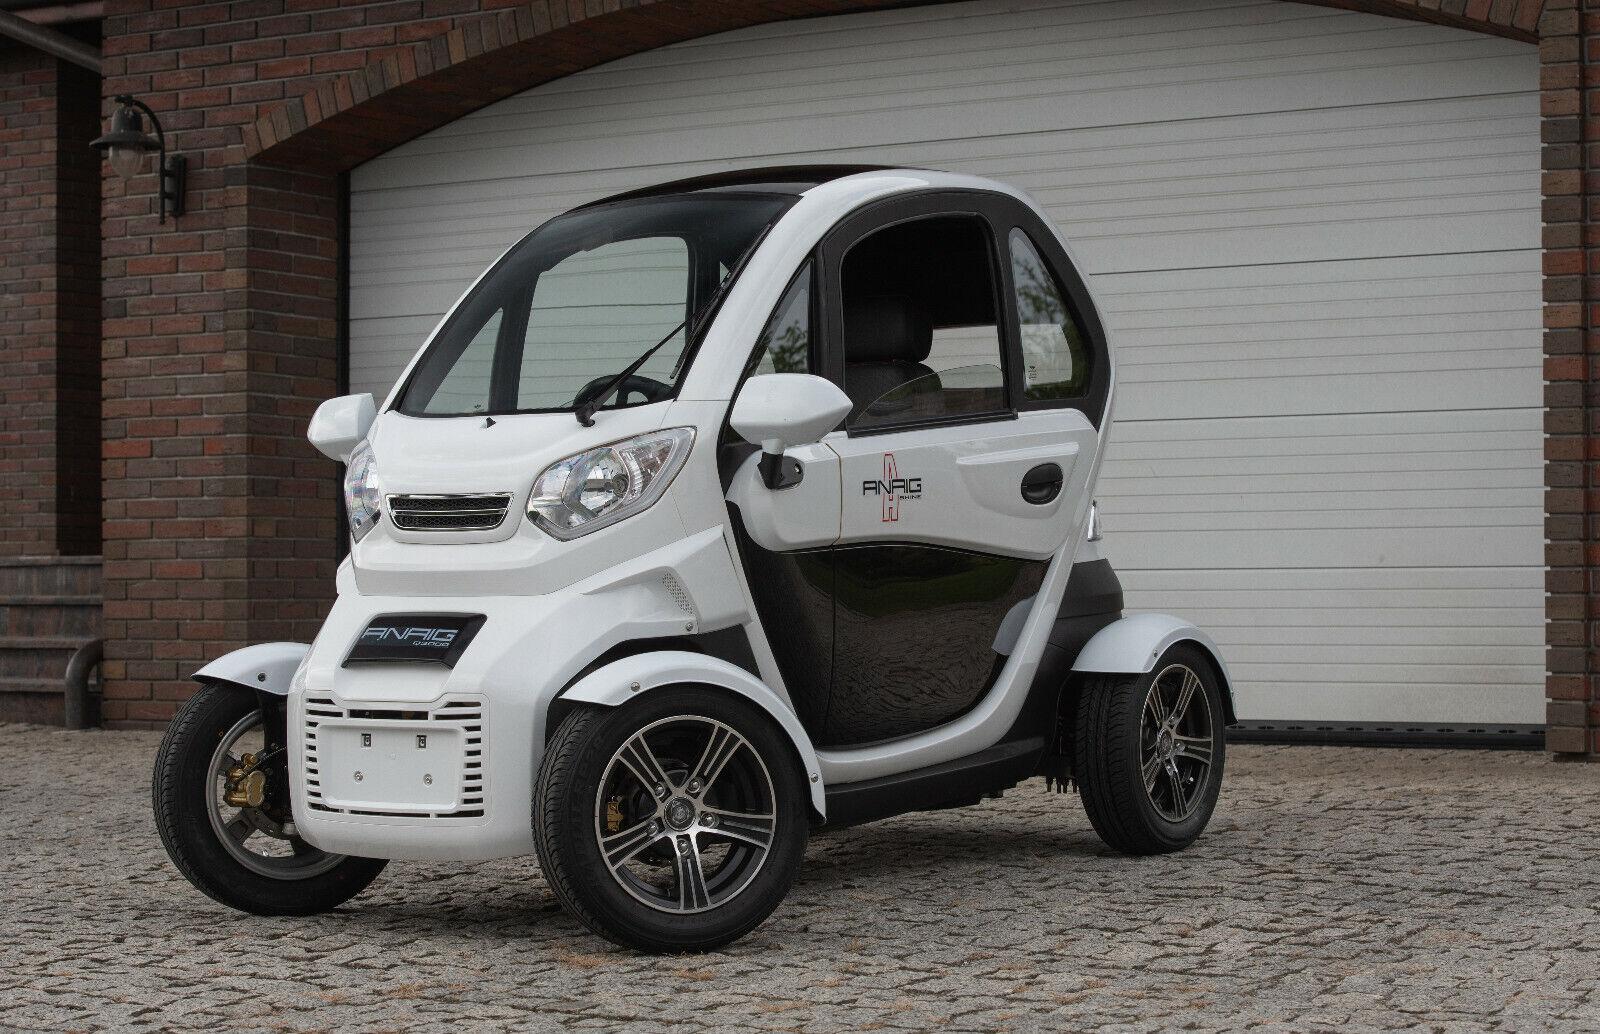 E-Auto,Kabinenroller,Mopedauto,Elektrokleinwagen, ANAIG 3000 Watt